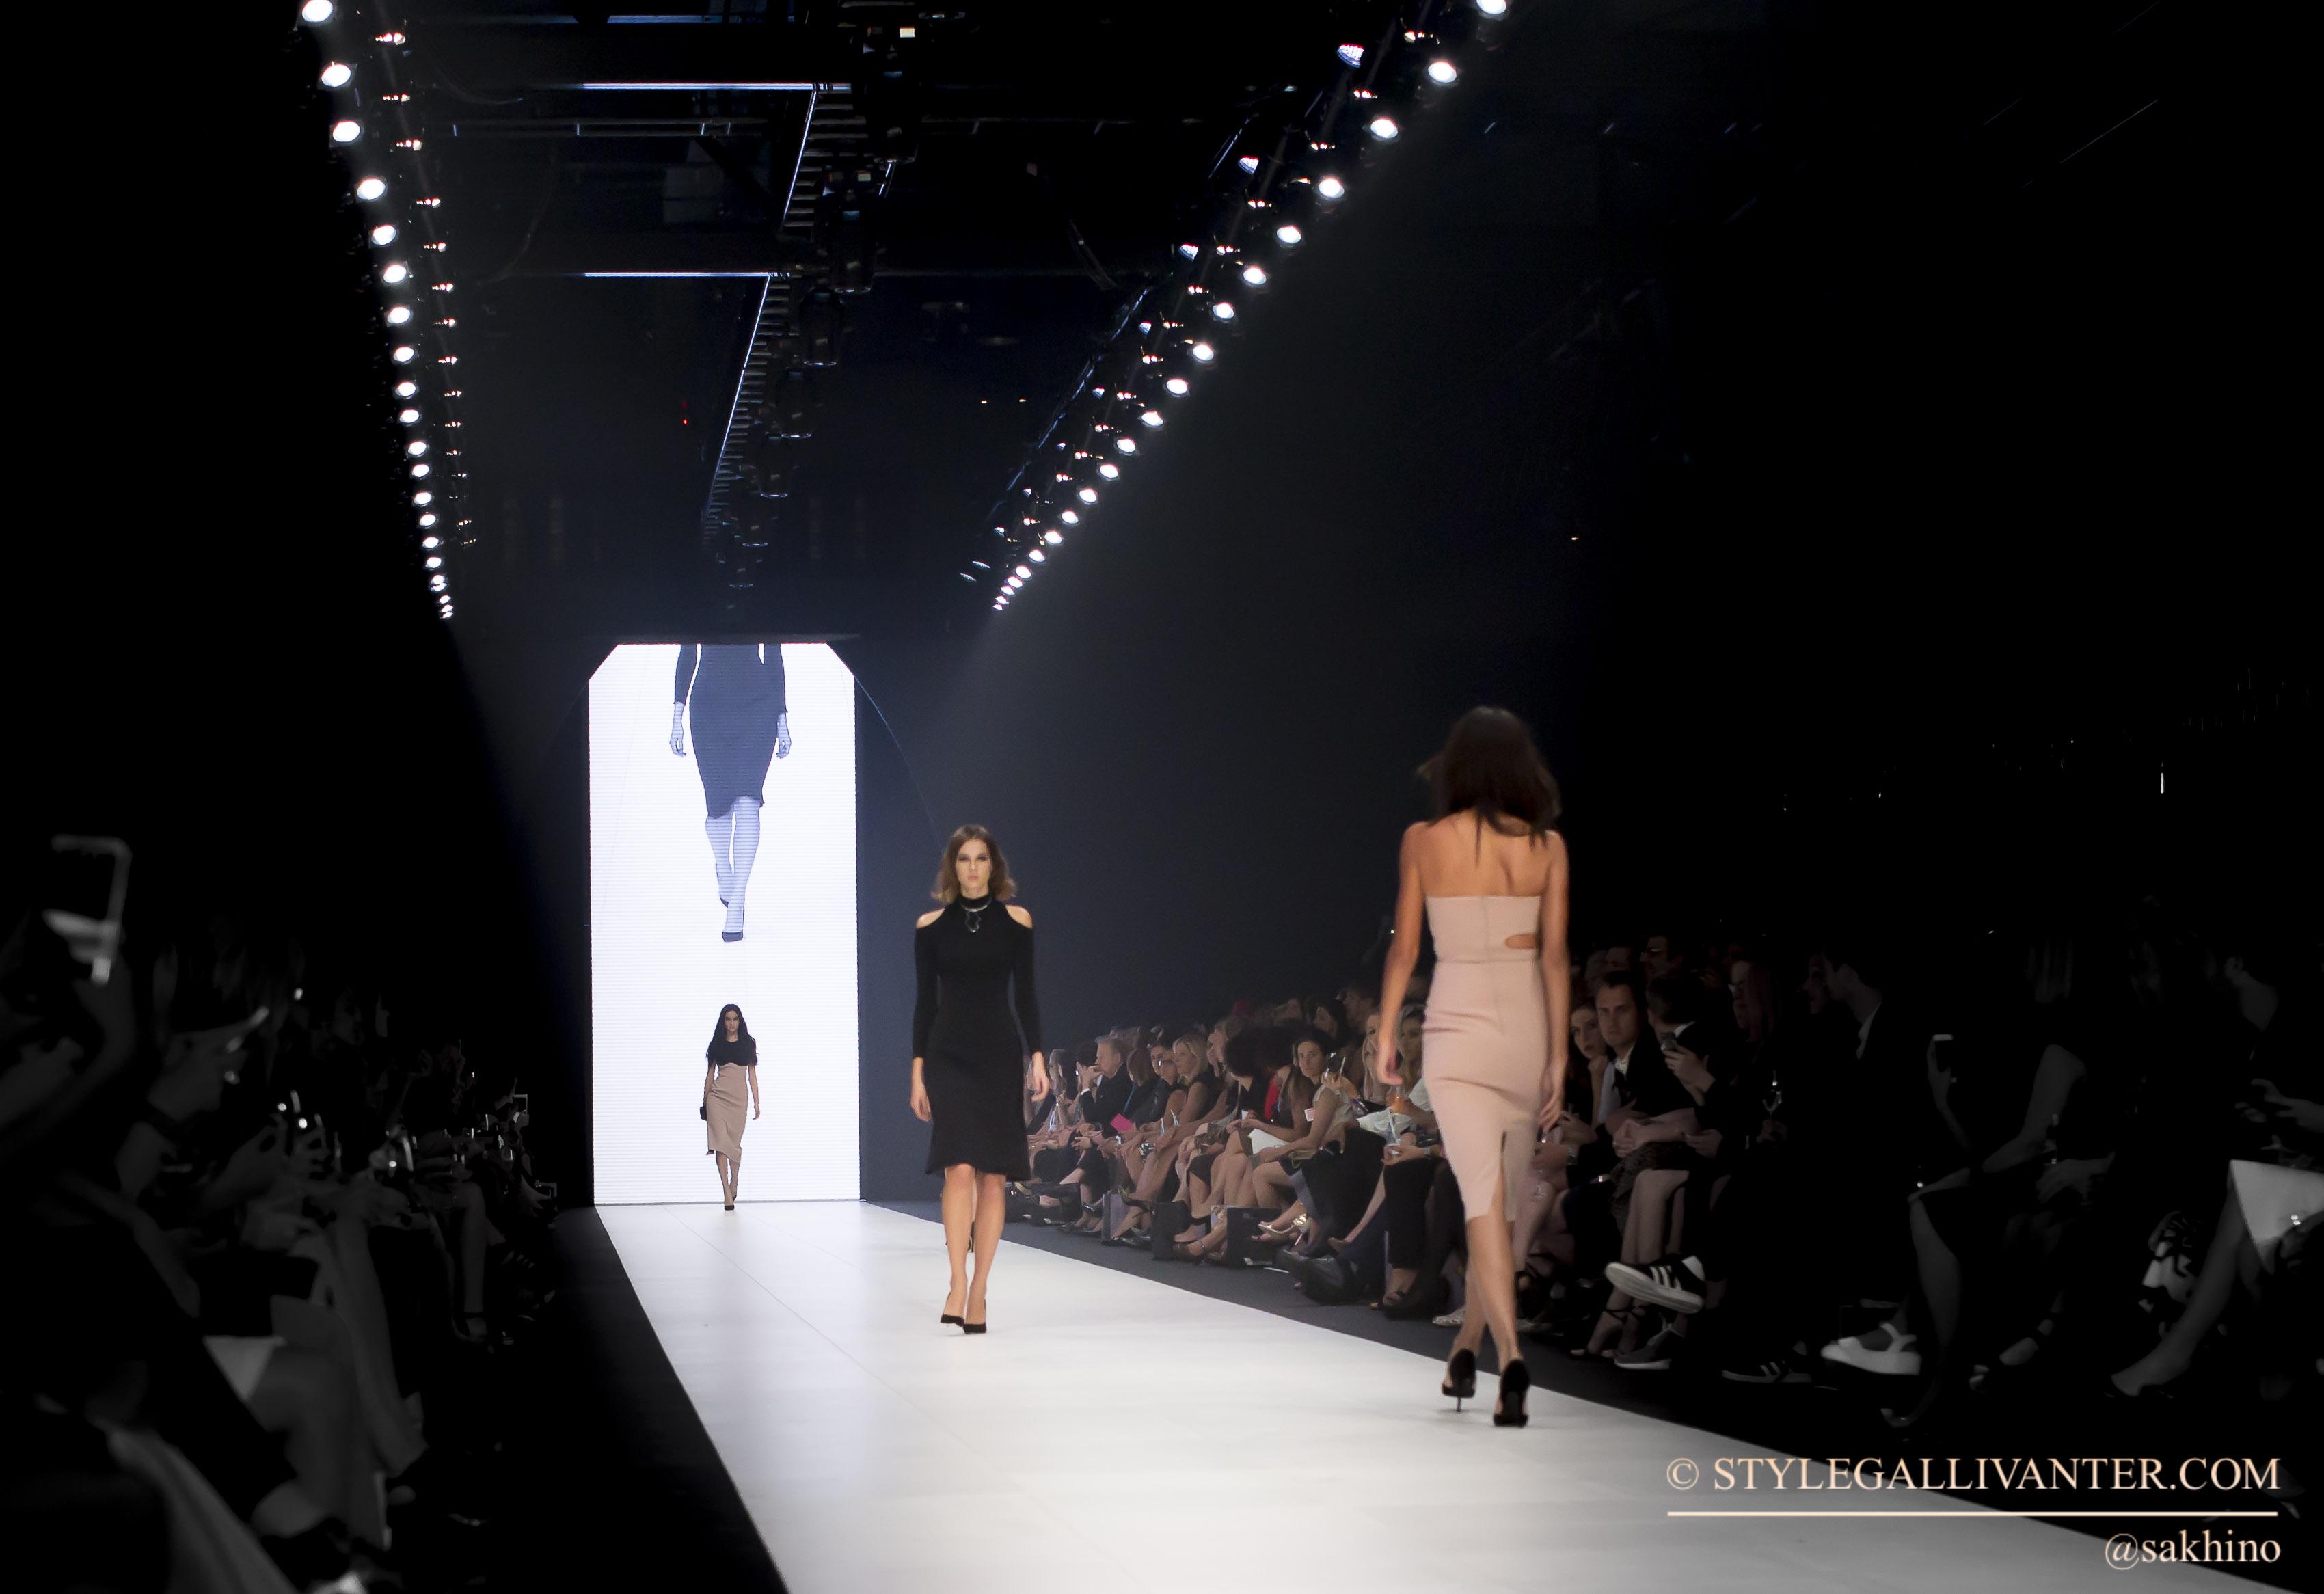 stylegallivanter_VAMFF-2015_VAMFF2015_VAMFF15_MELBOURNE-FASHION-WEEKS-2015_best-dressed-VAMFF-2015_YEOJI-BAE-VAMFF-2015_VAMFF-bloggers-2015_CARLA-ZAMPATTI-2015-VAMFF-2